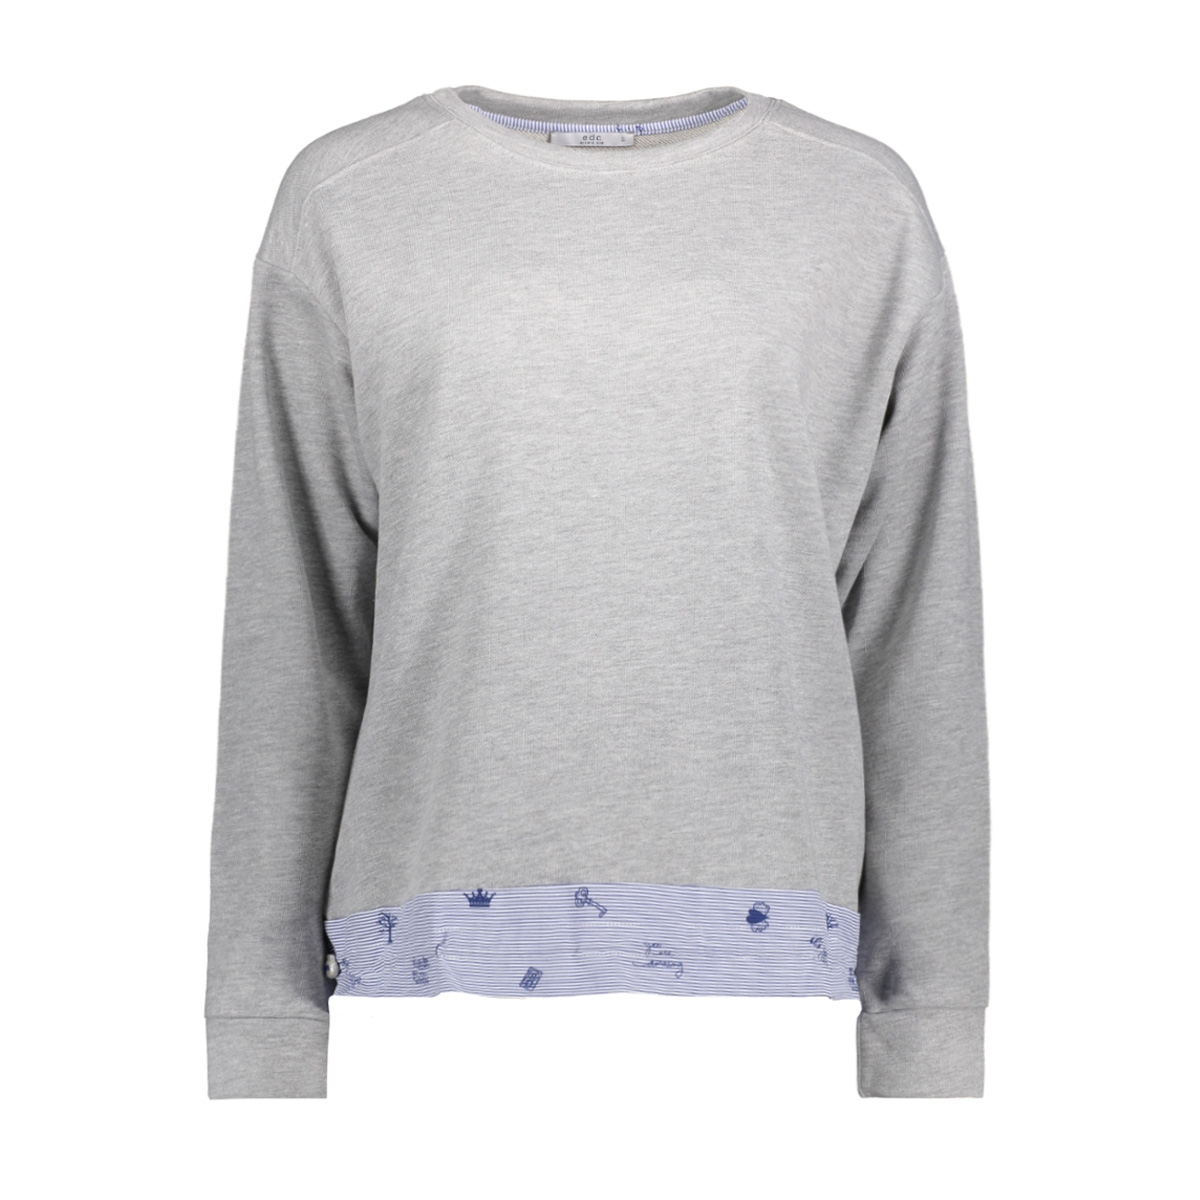 107cc1j026 edc sweater c039